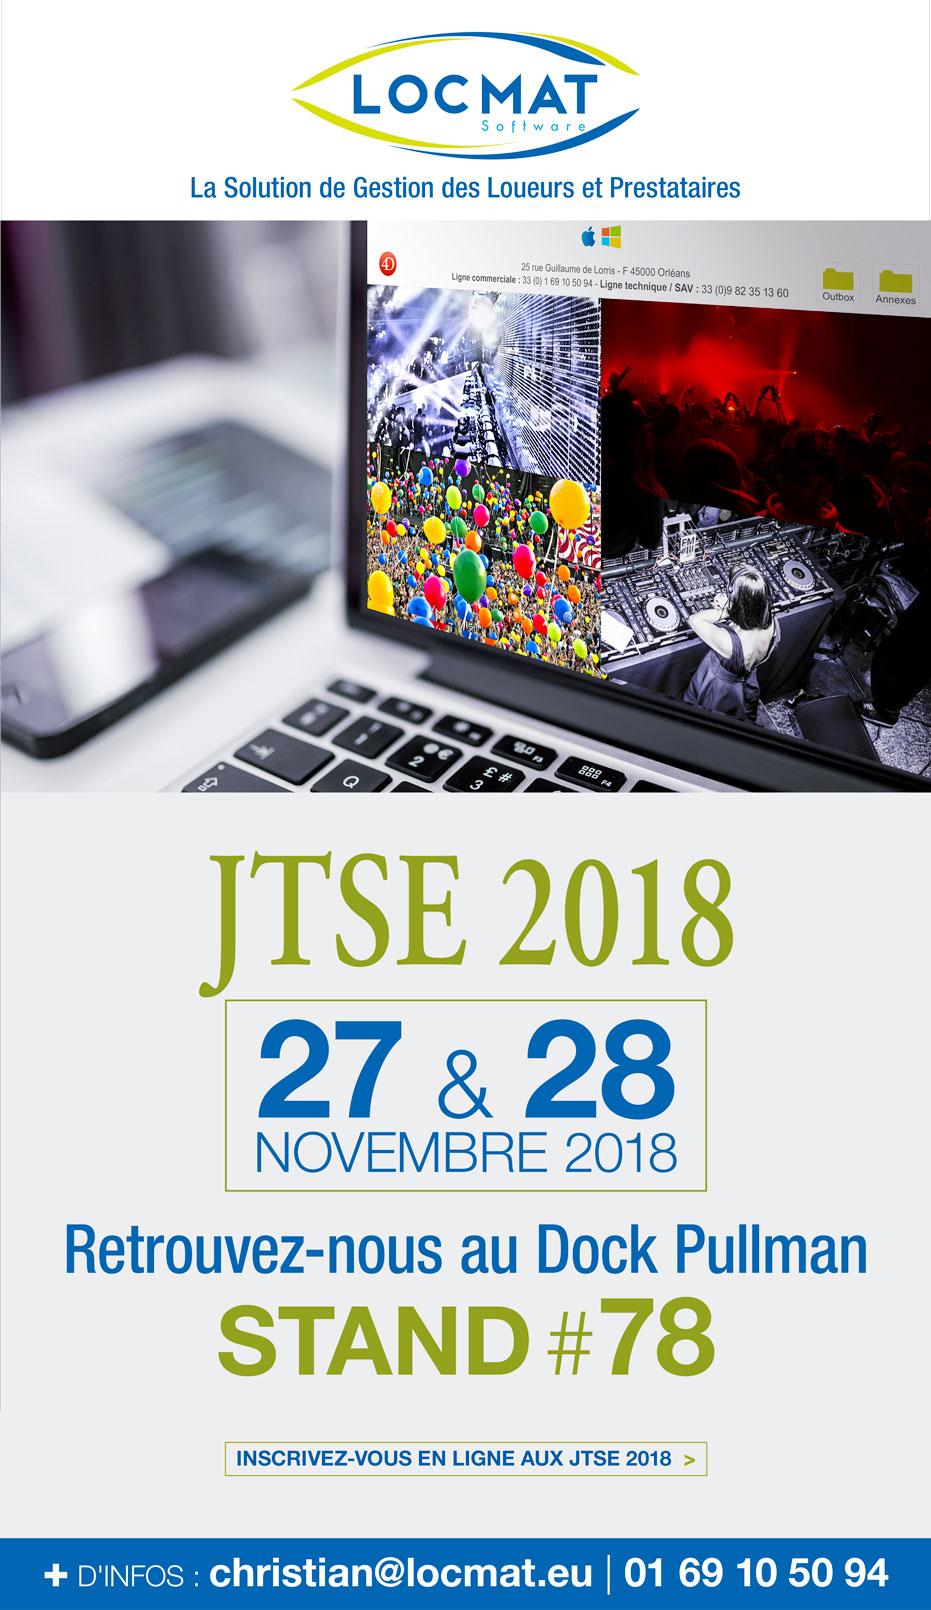 RDV aux JTSE 2018 Stand #78